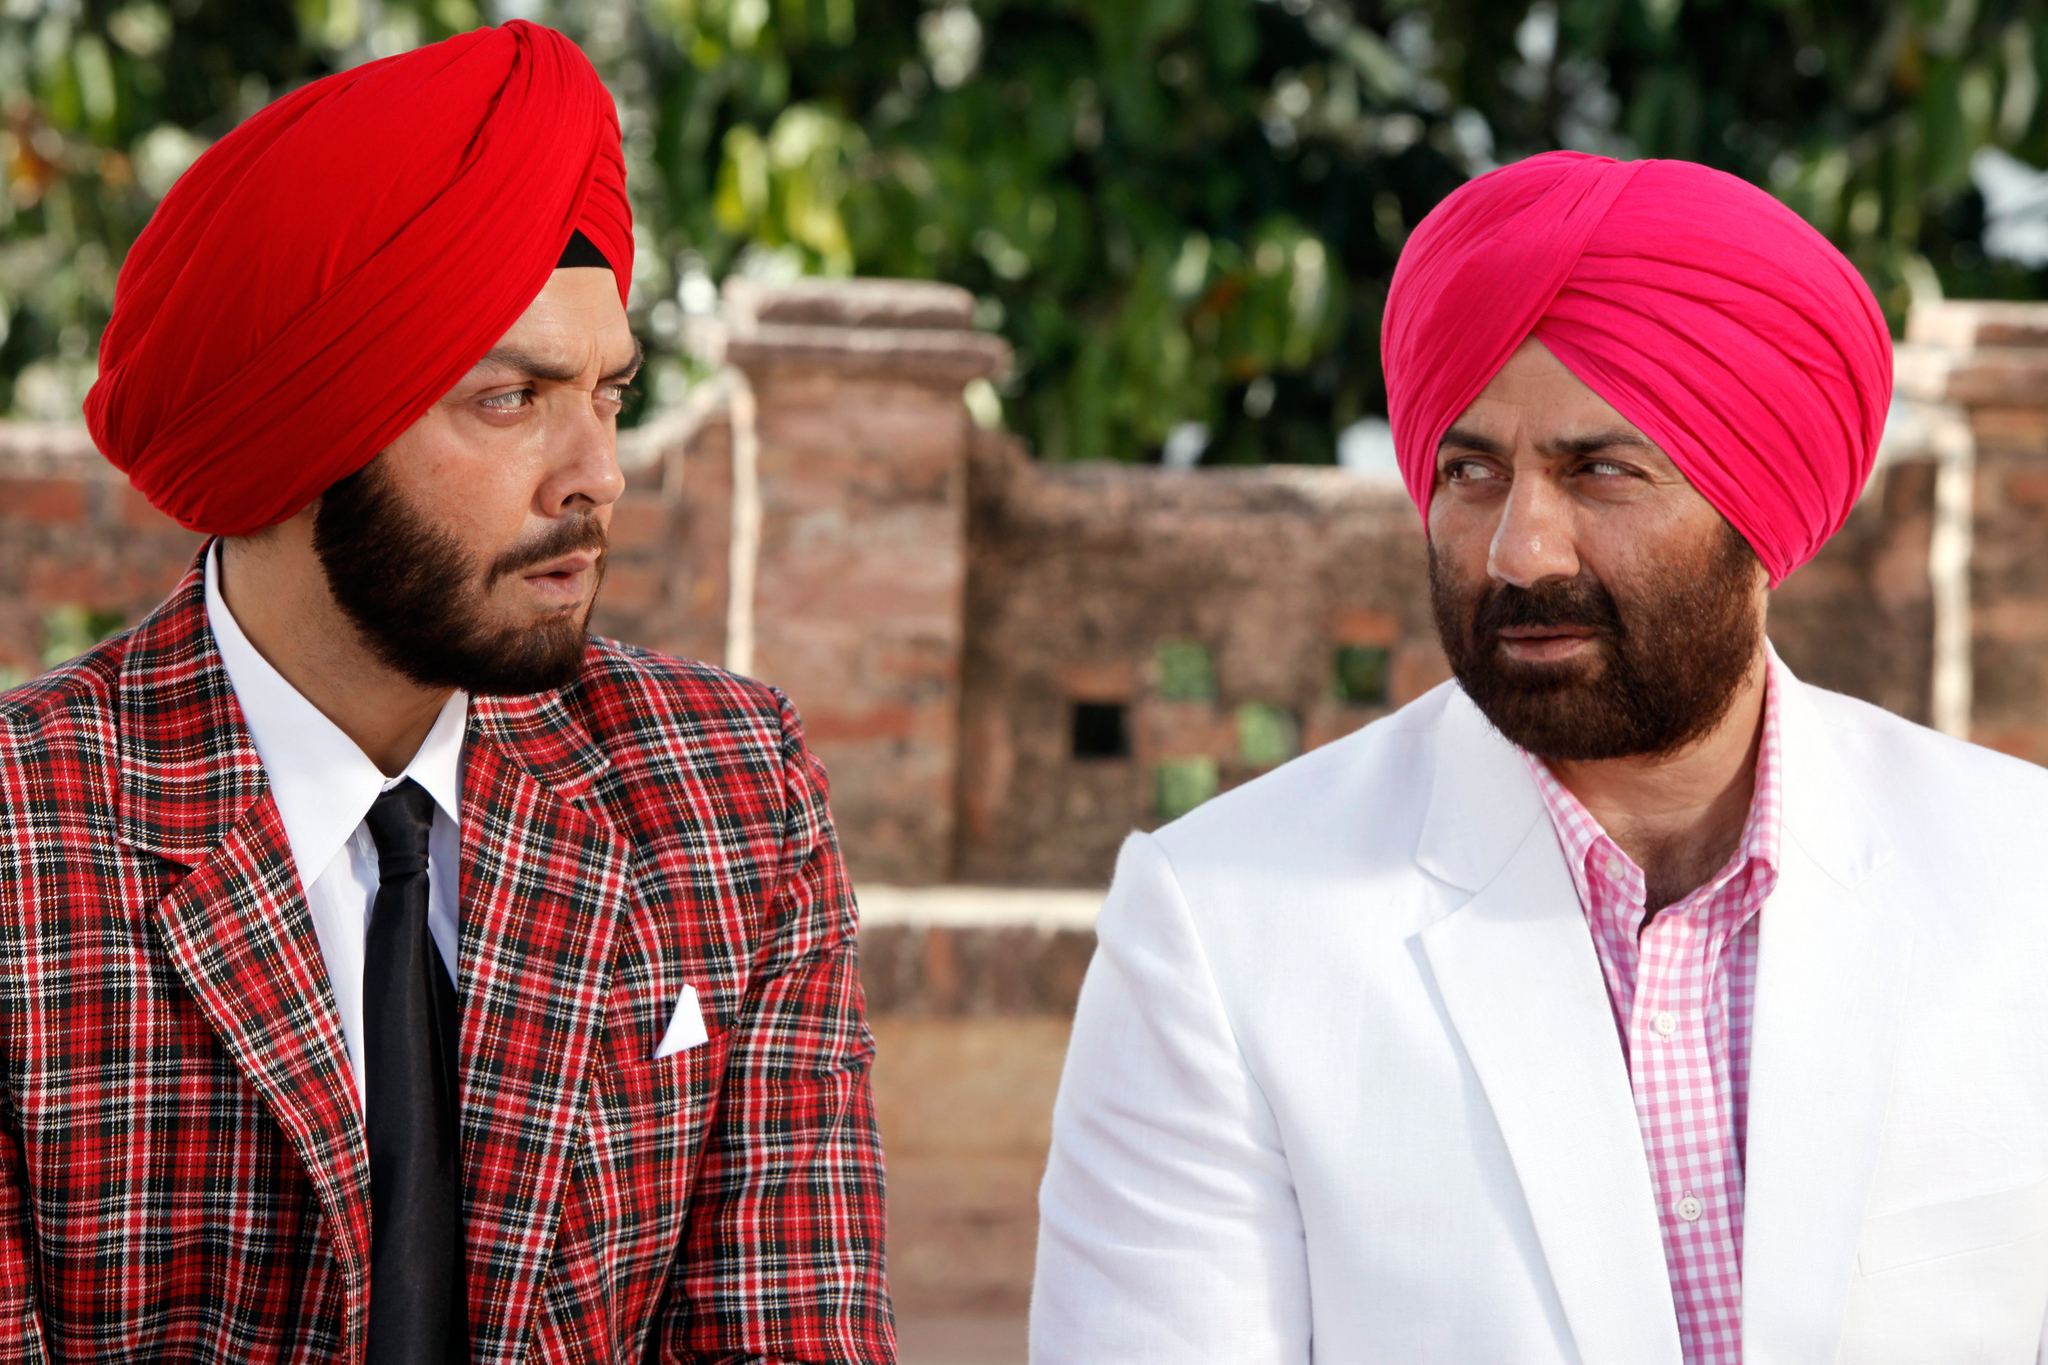 Still of Bobby Deol and Sunny Deol in Yamla Pagla Deewana (2011)